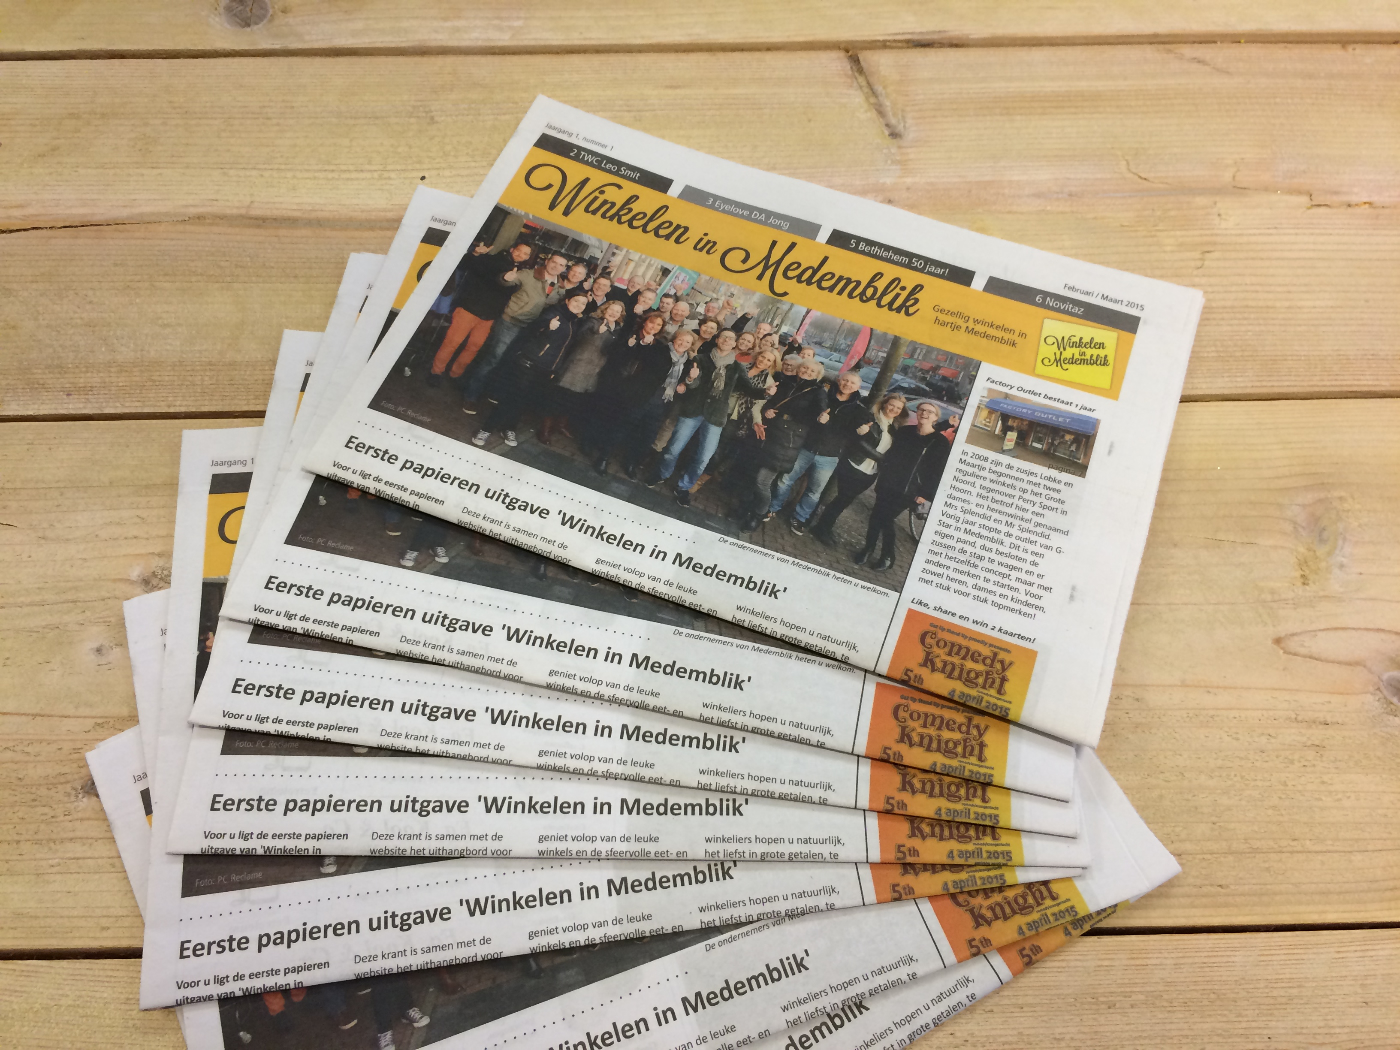 PC Reclame - Winkelen in Medemblik krant-1